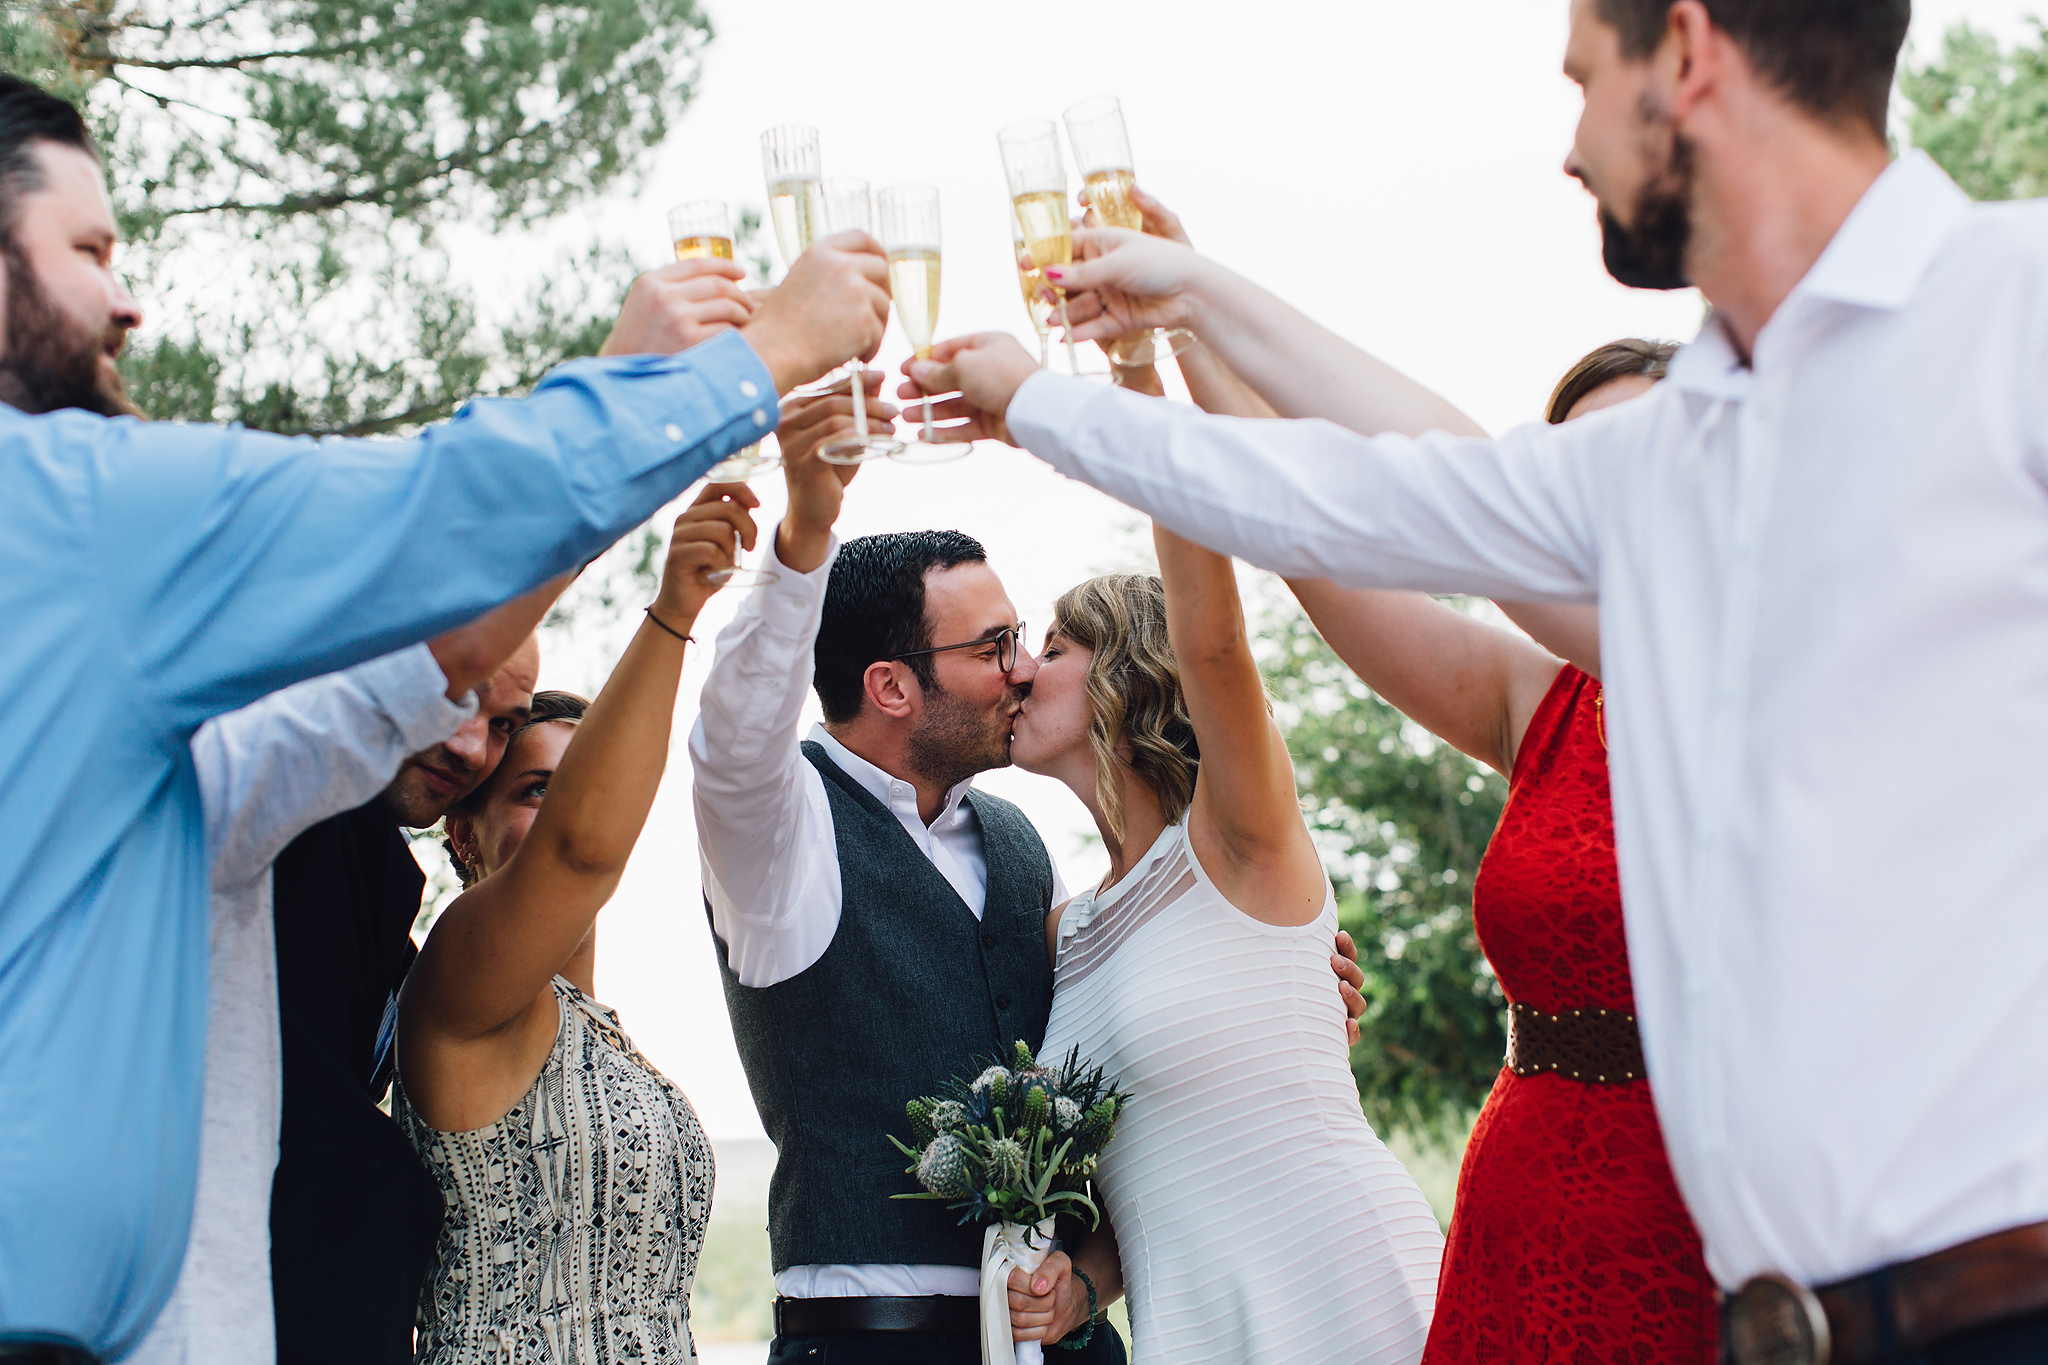 el-paso-wedding-photographer-5.jpg